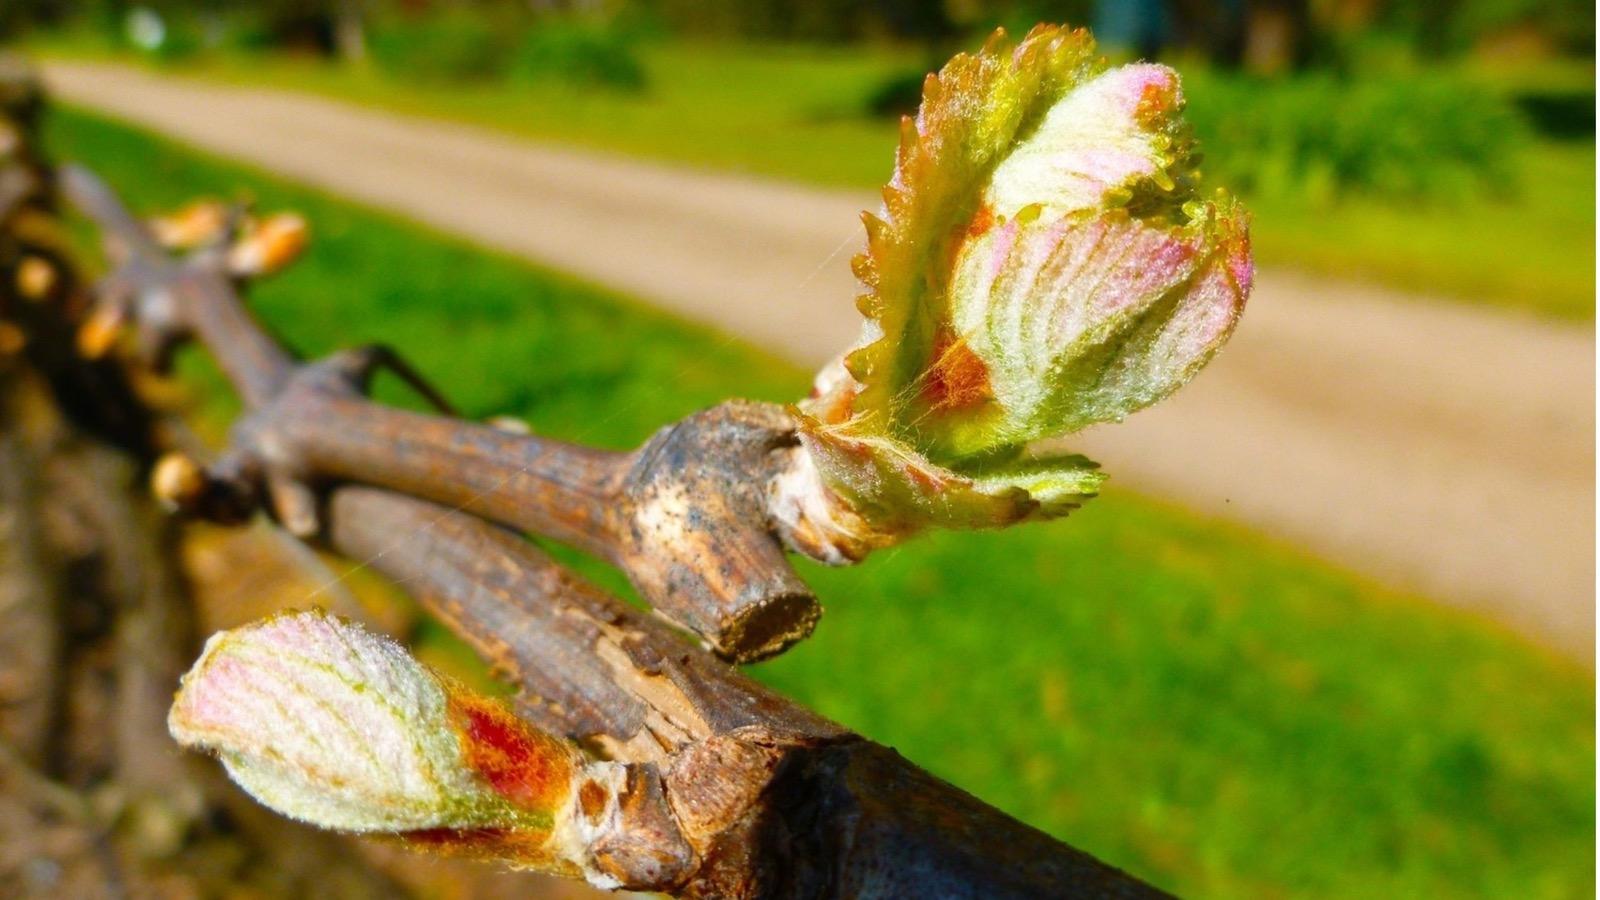 A biodynamic vineyard - no herbicides or pesticides produce healthy vines